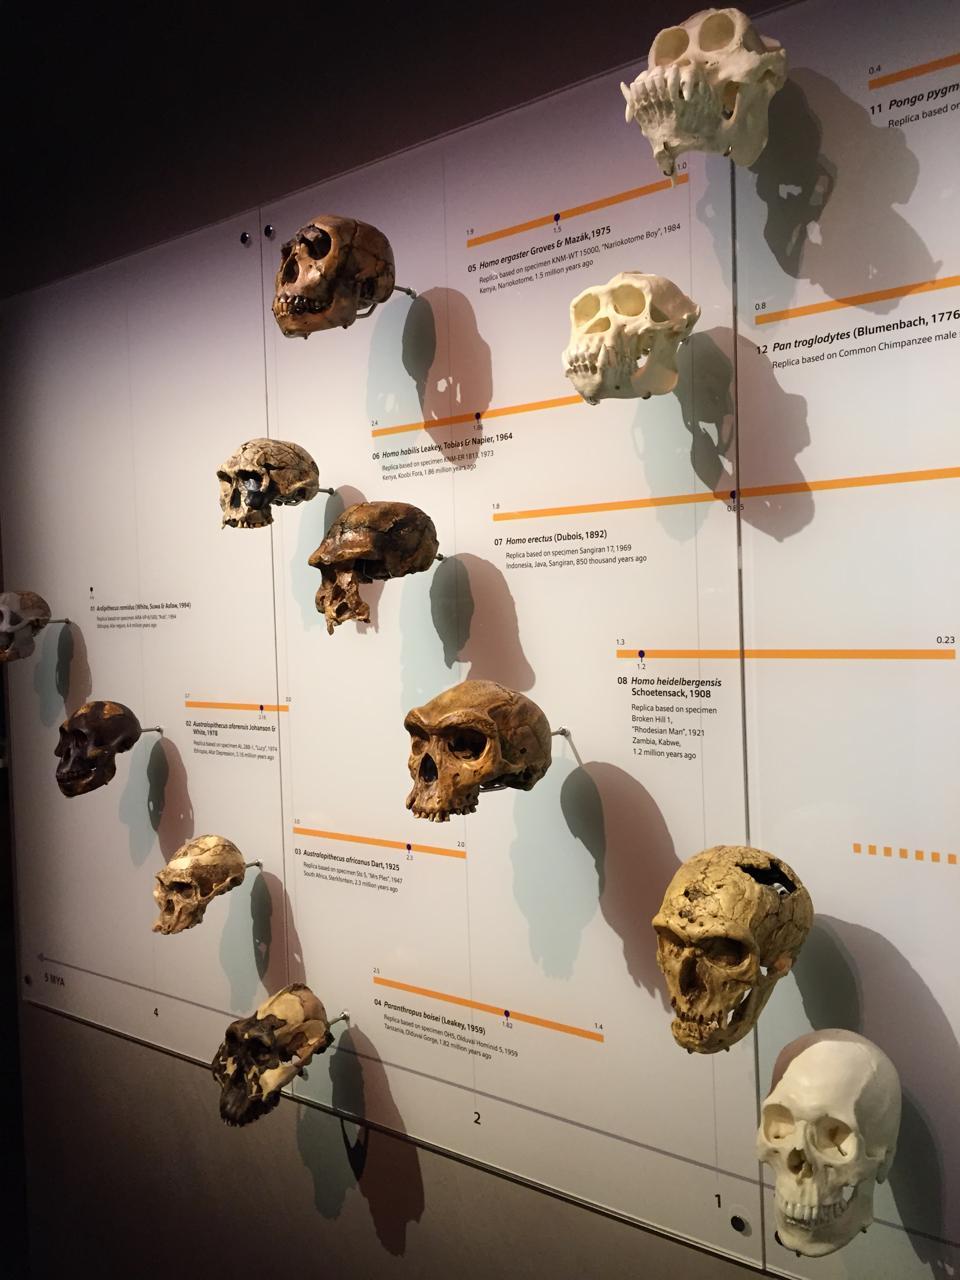 A display of hominid skulls at the Lee Kong Chian Natural History Museum, Singapore.